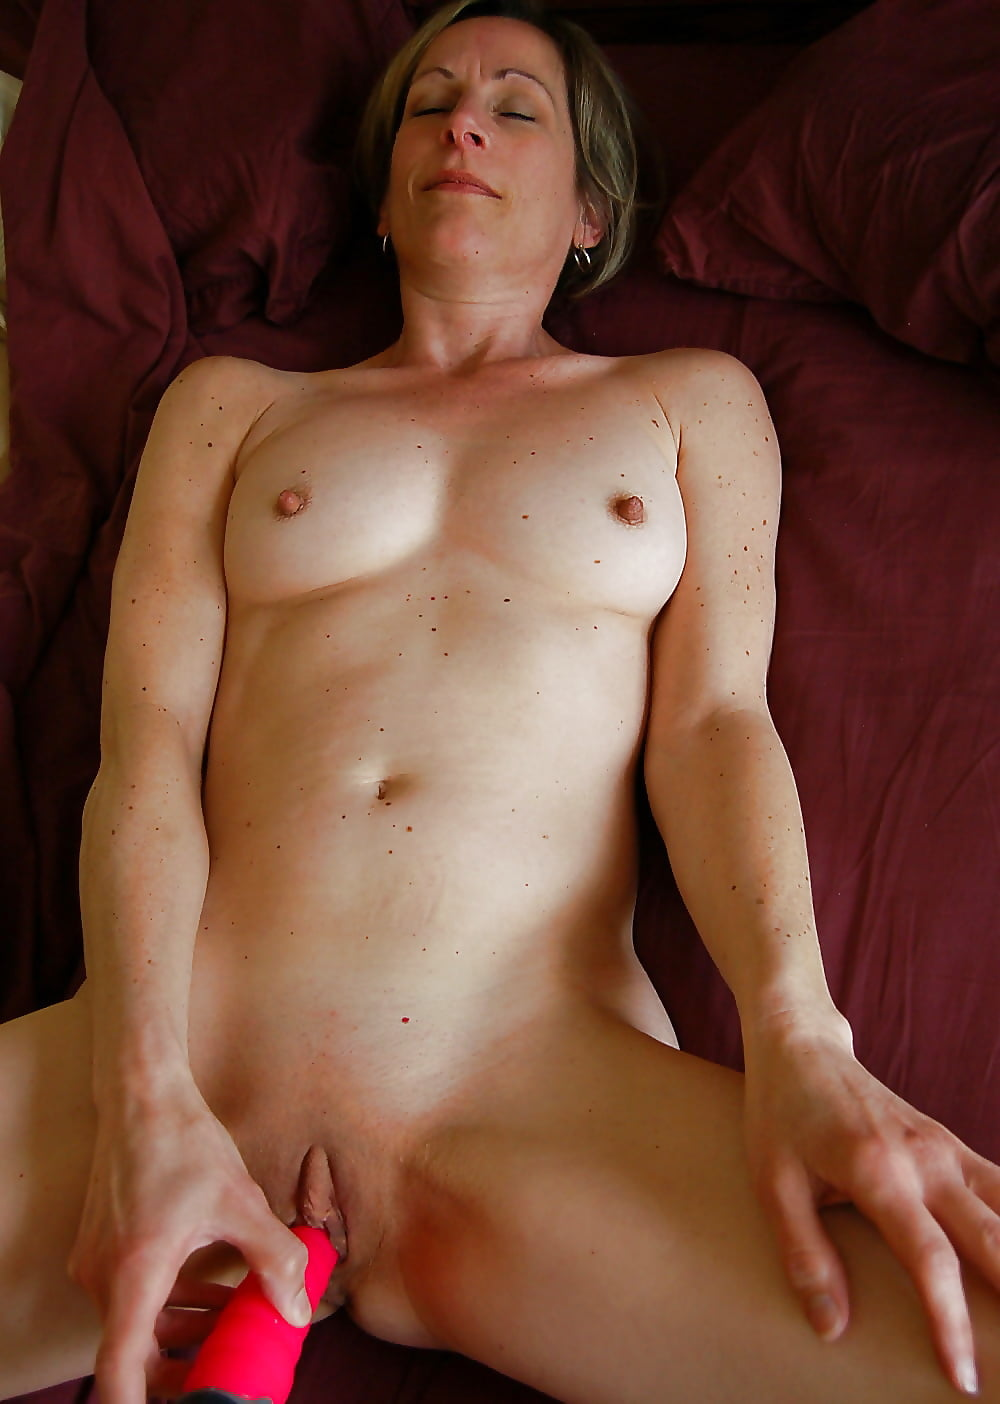 Hairy Naked Mom Masturbating Together